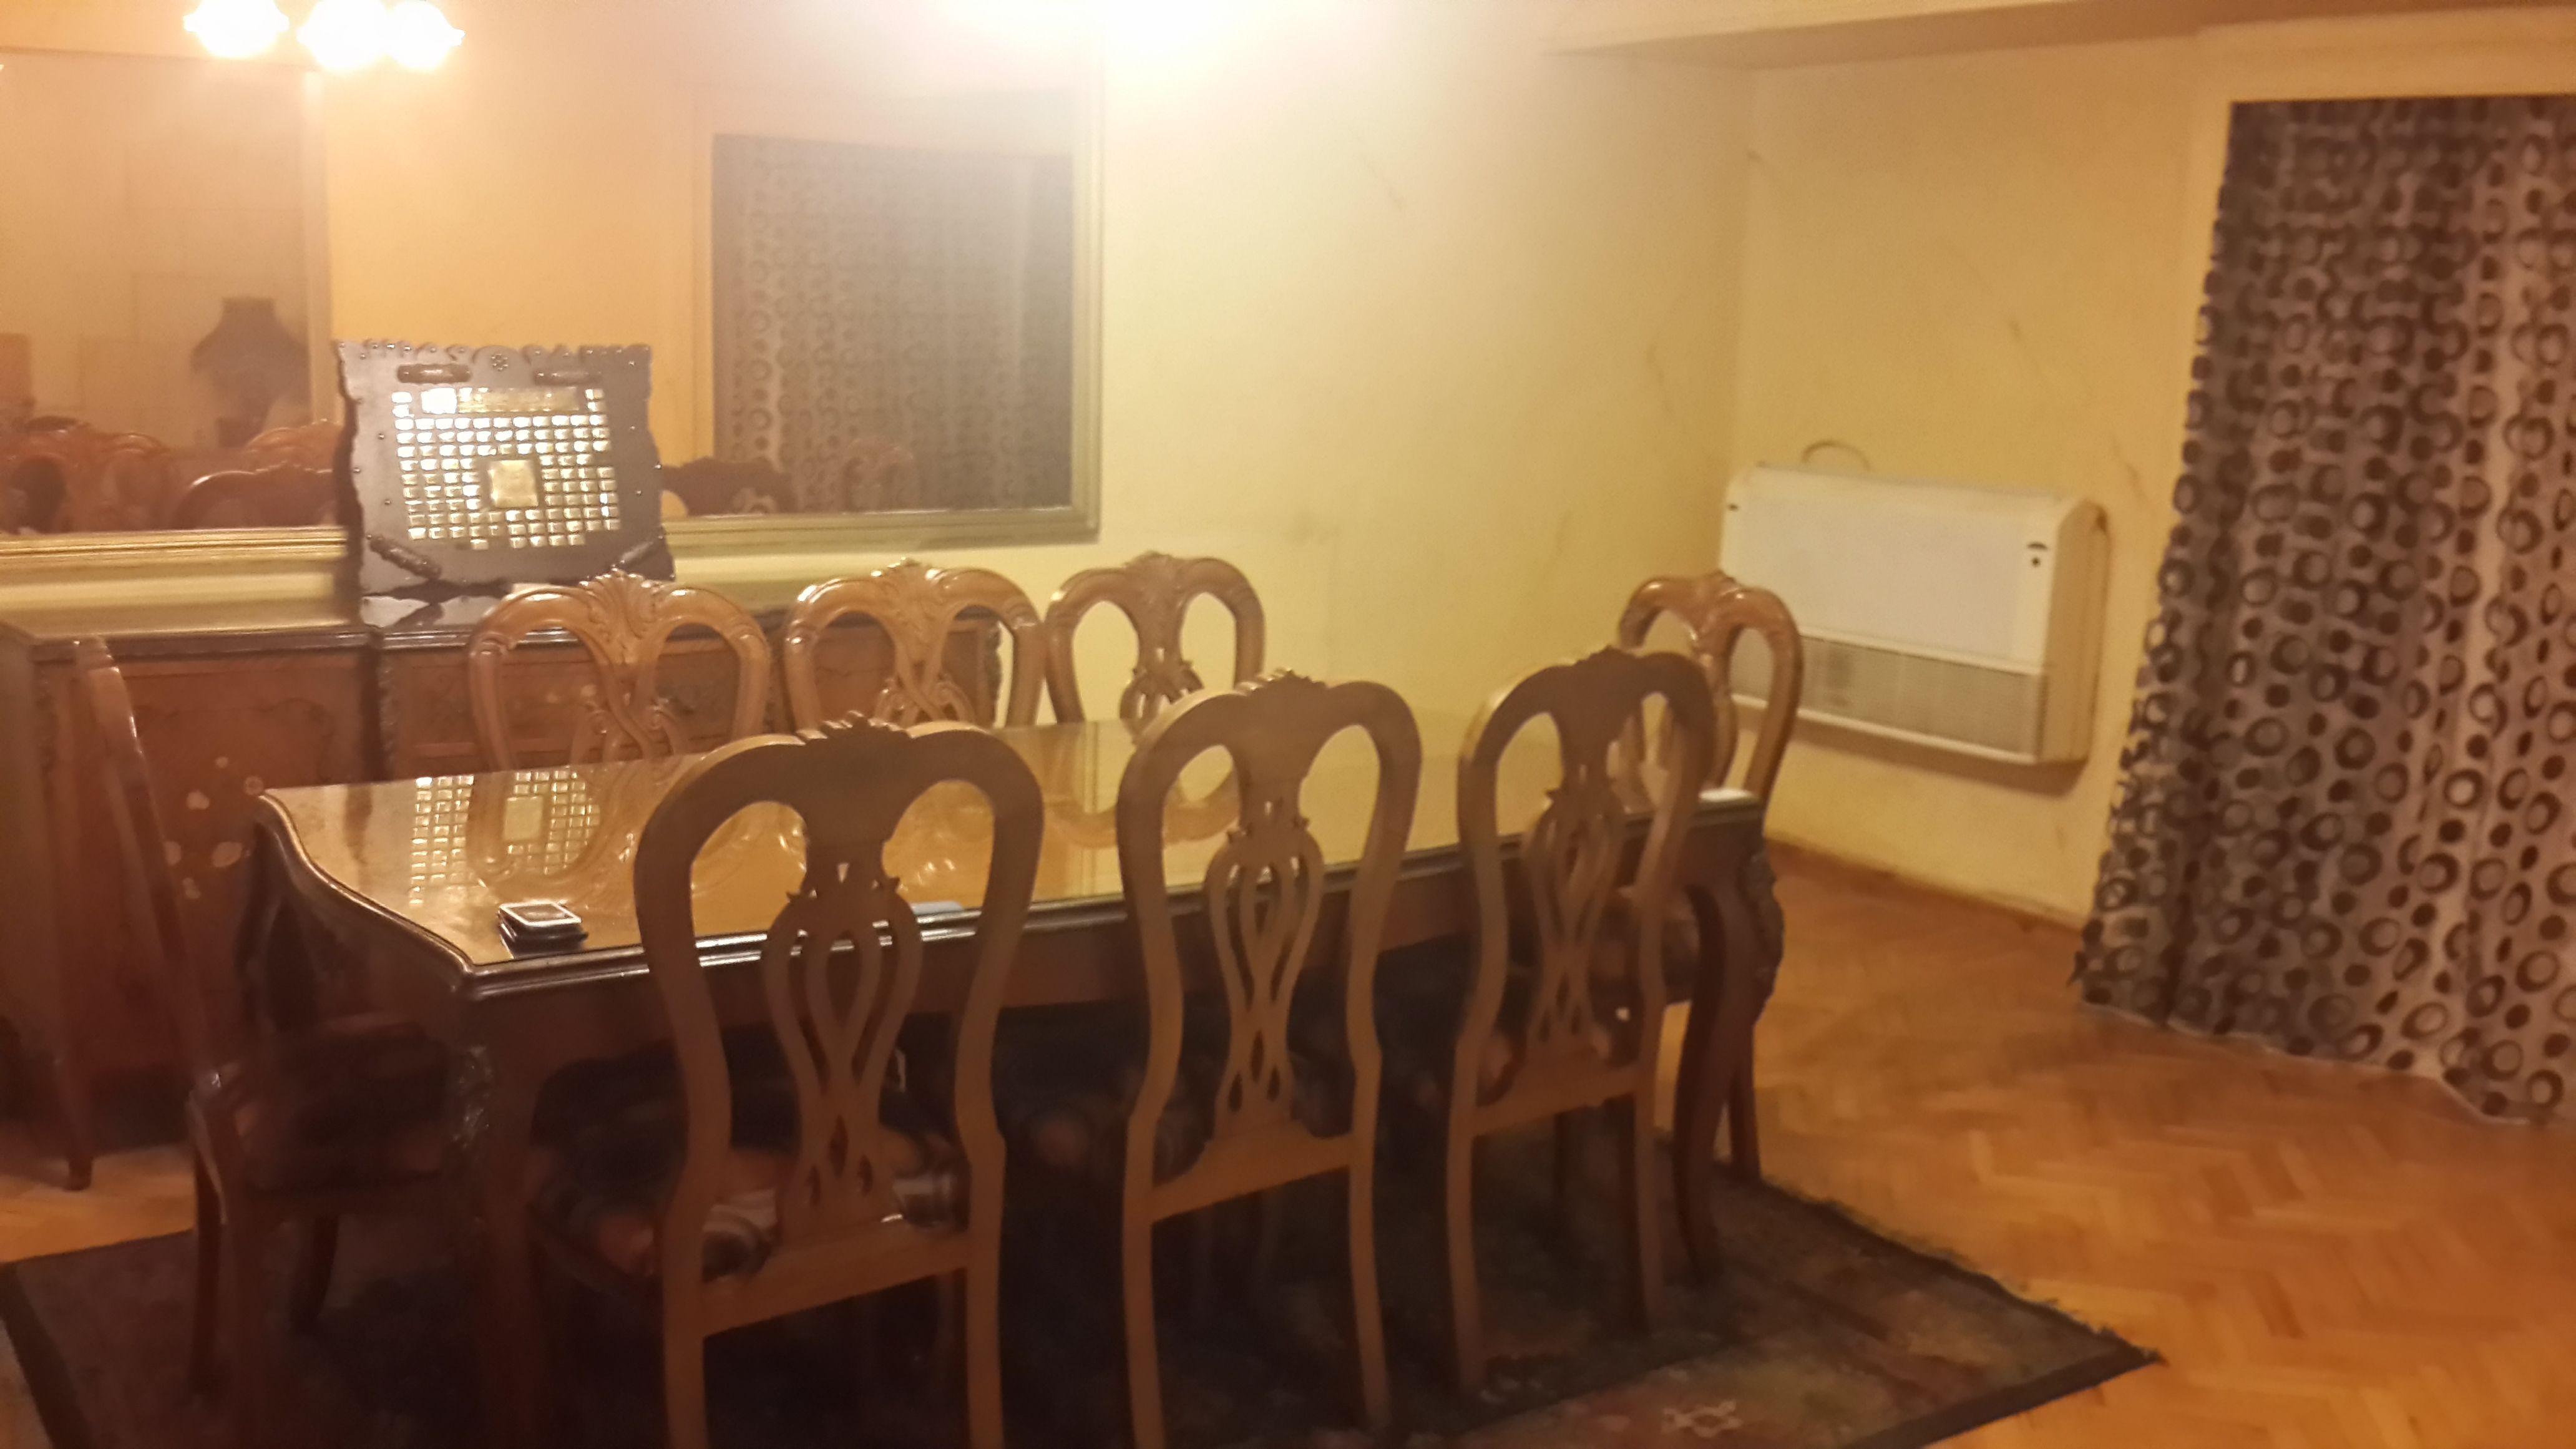 شقق للايجار الجديد بـالمهندسين بـالمهندسين 2016 184148 عقارى Home Decor Home Apartment